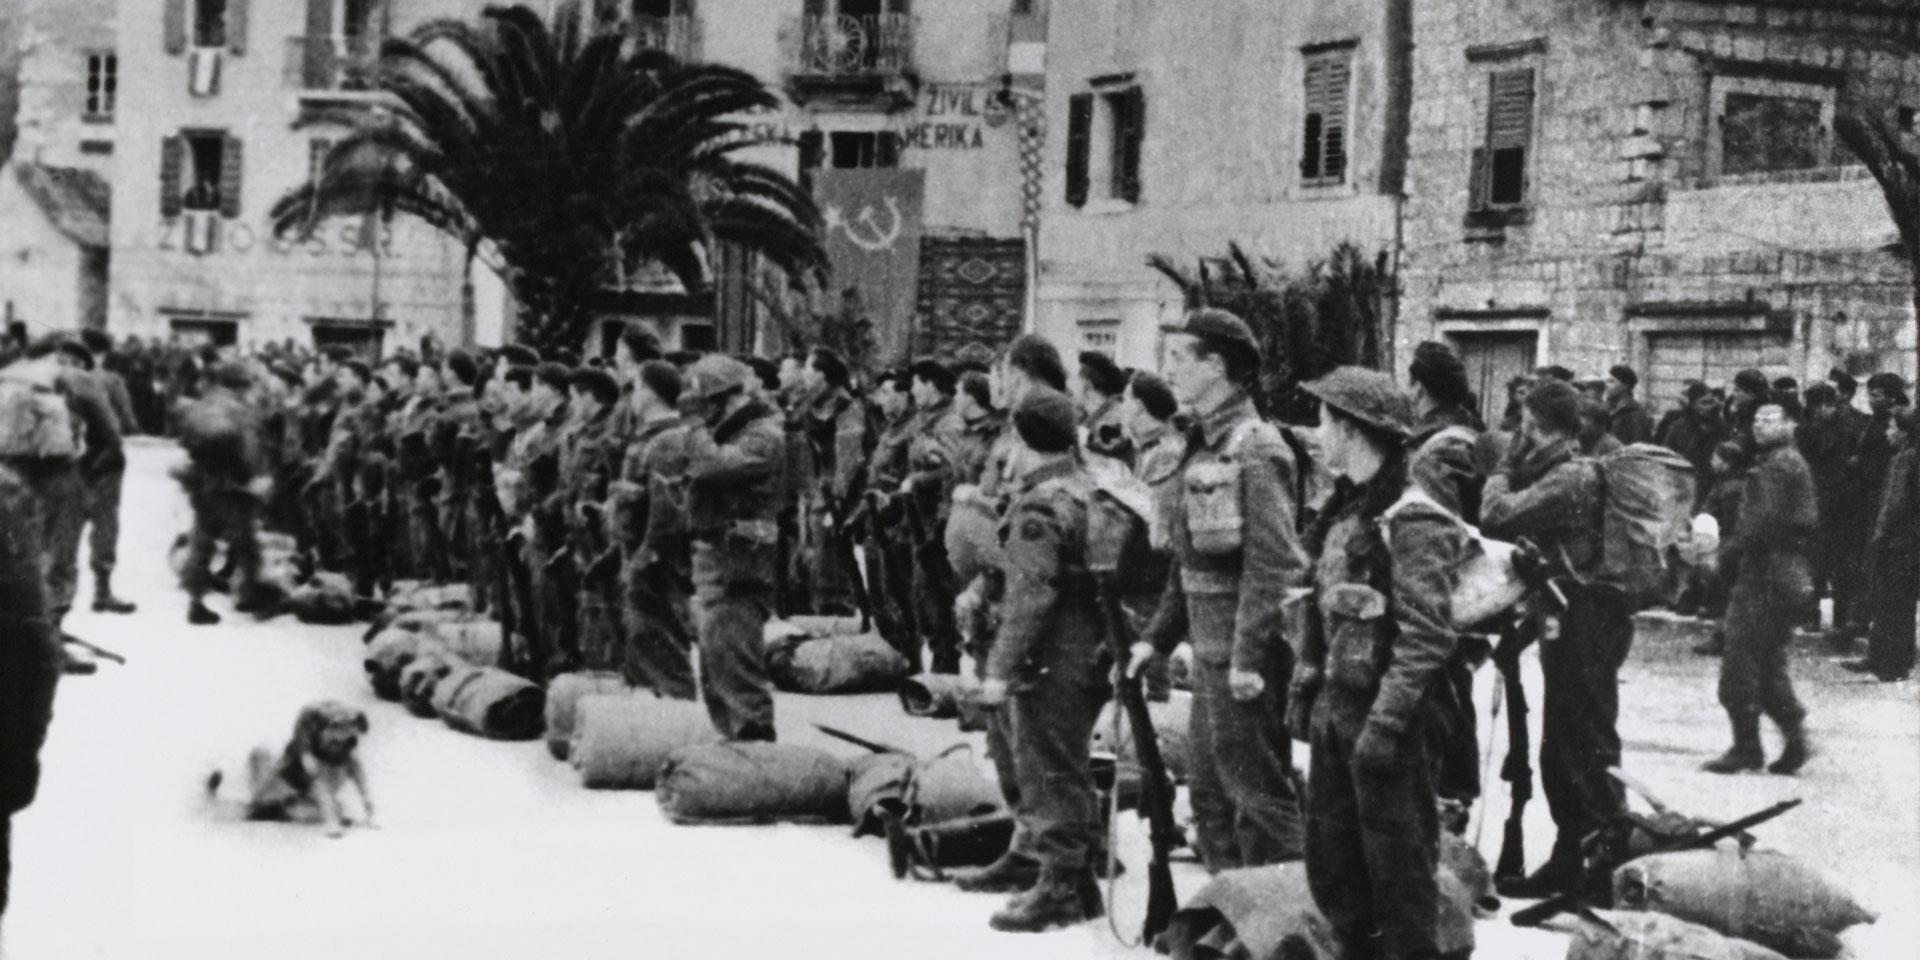 British Commandos at Komiza on the island of Vis, 1944